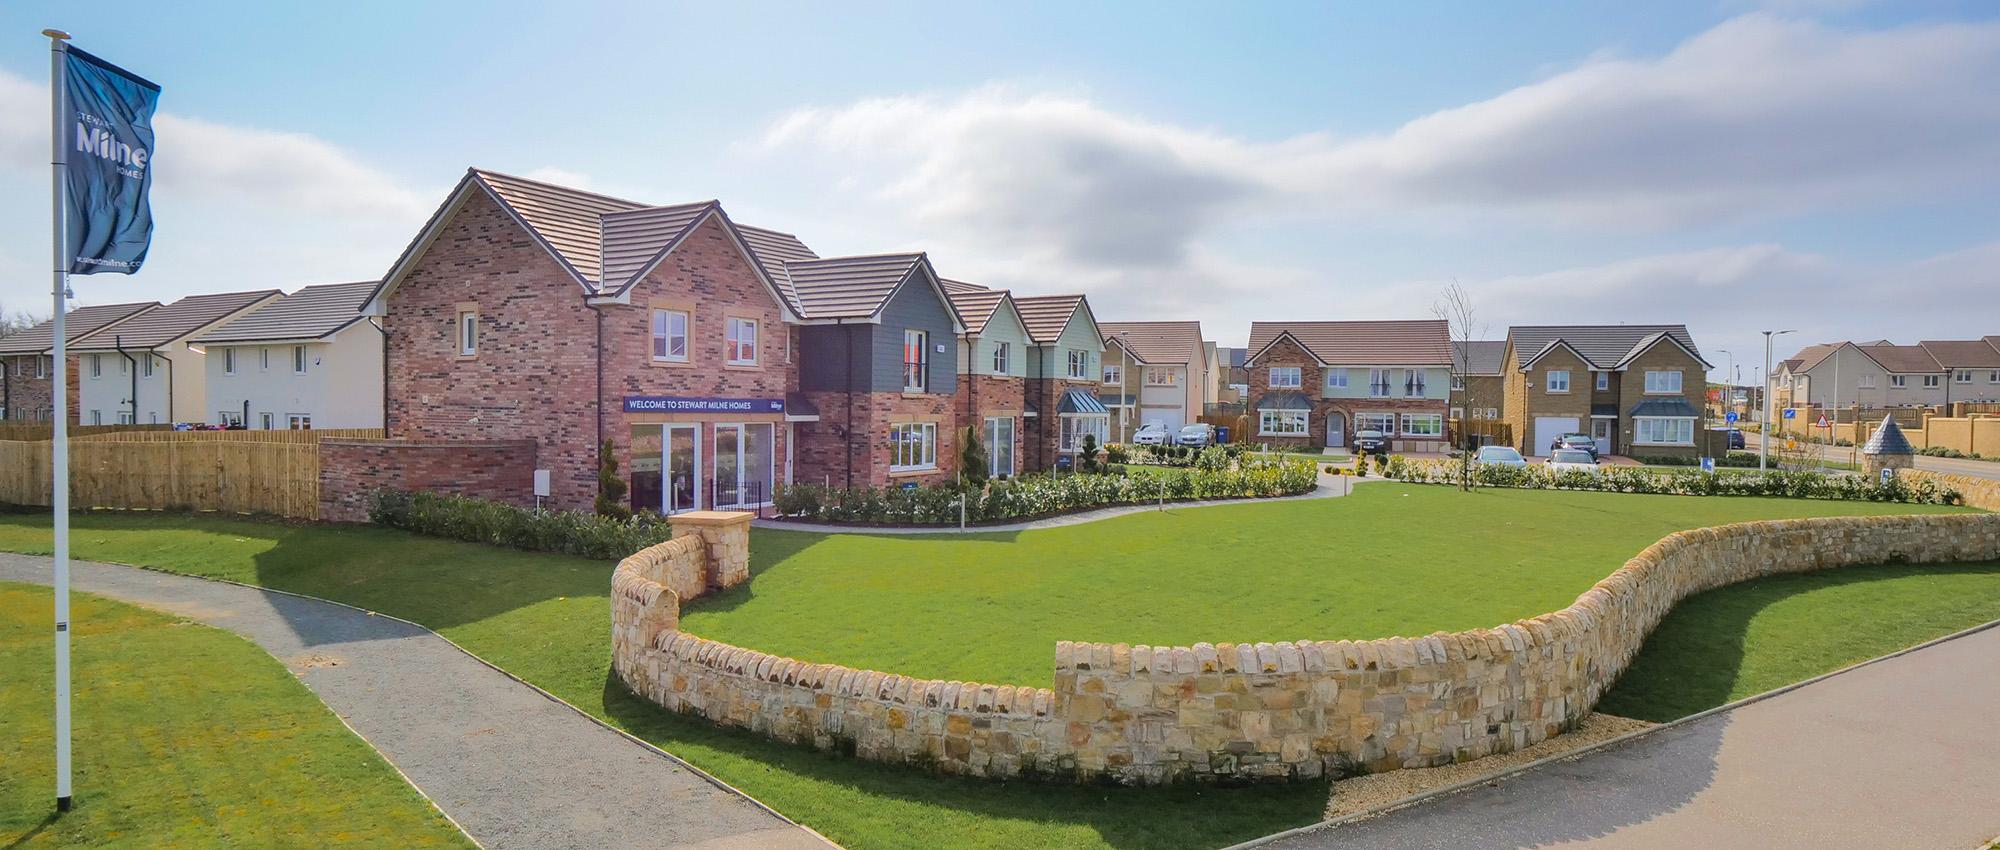 Brackenhill Park Stewart Milne Homes